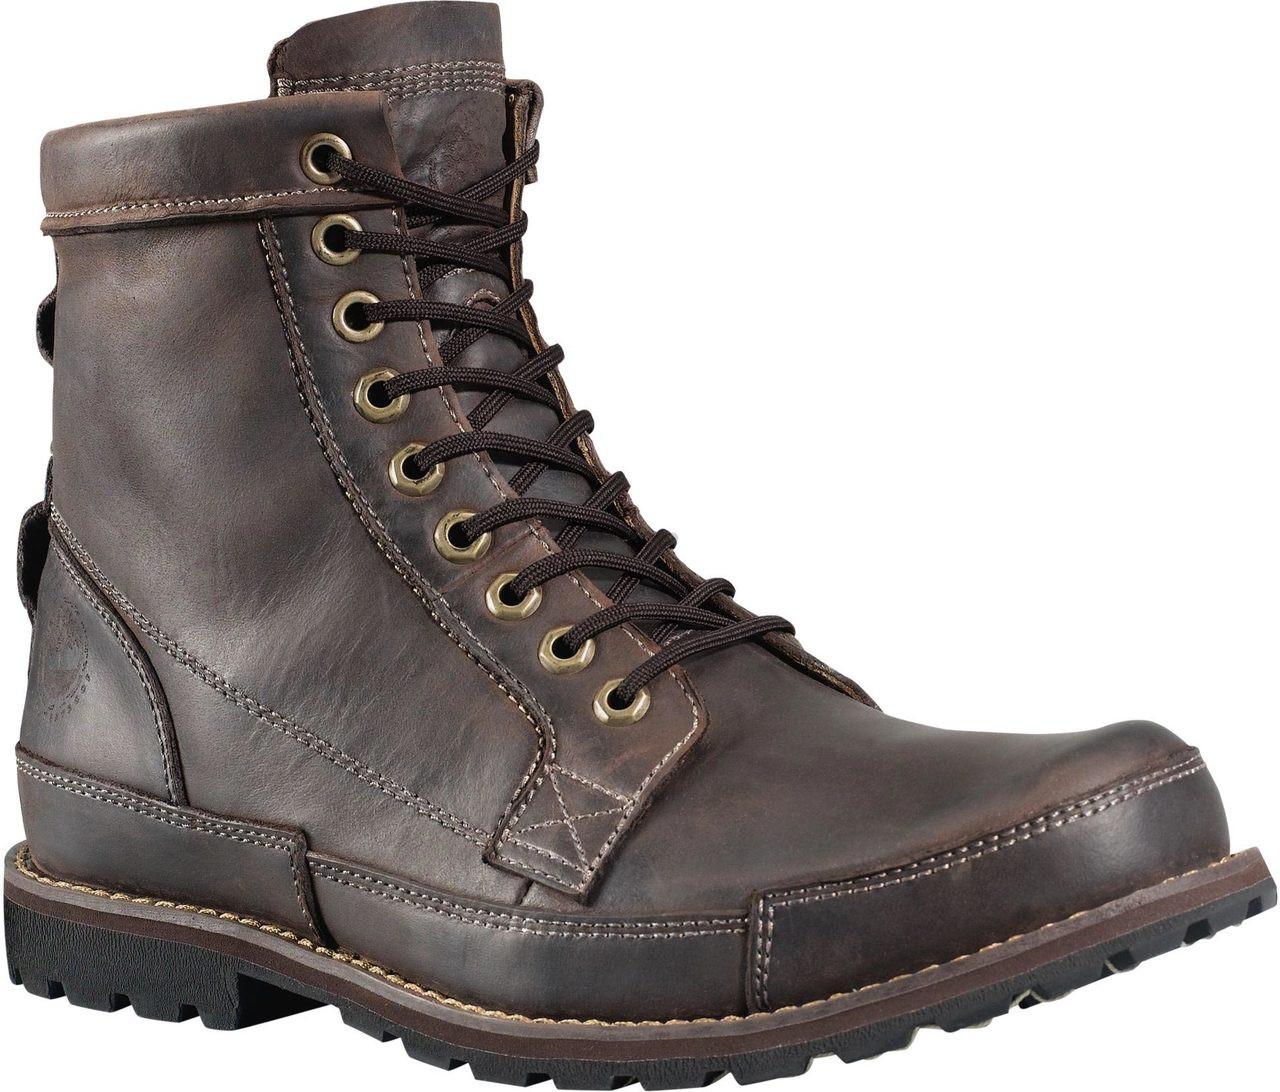 e1d11bdd30f ... Boots; Timberland Men's Earthkeepers Original Leather 6-Inch. Dark  Brown · Dark Brown · Dark Brown Oiled Nubuck ...